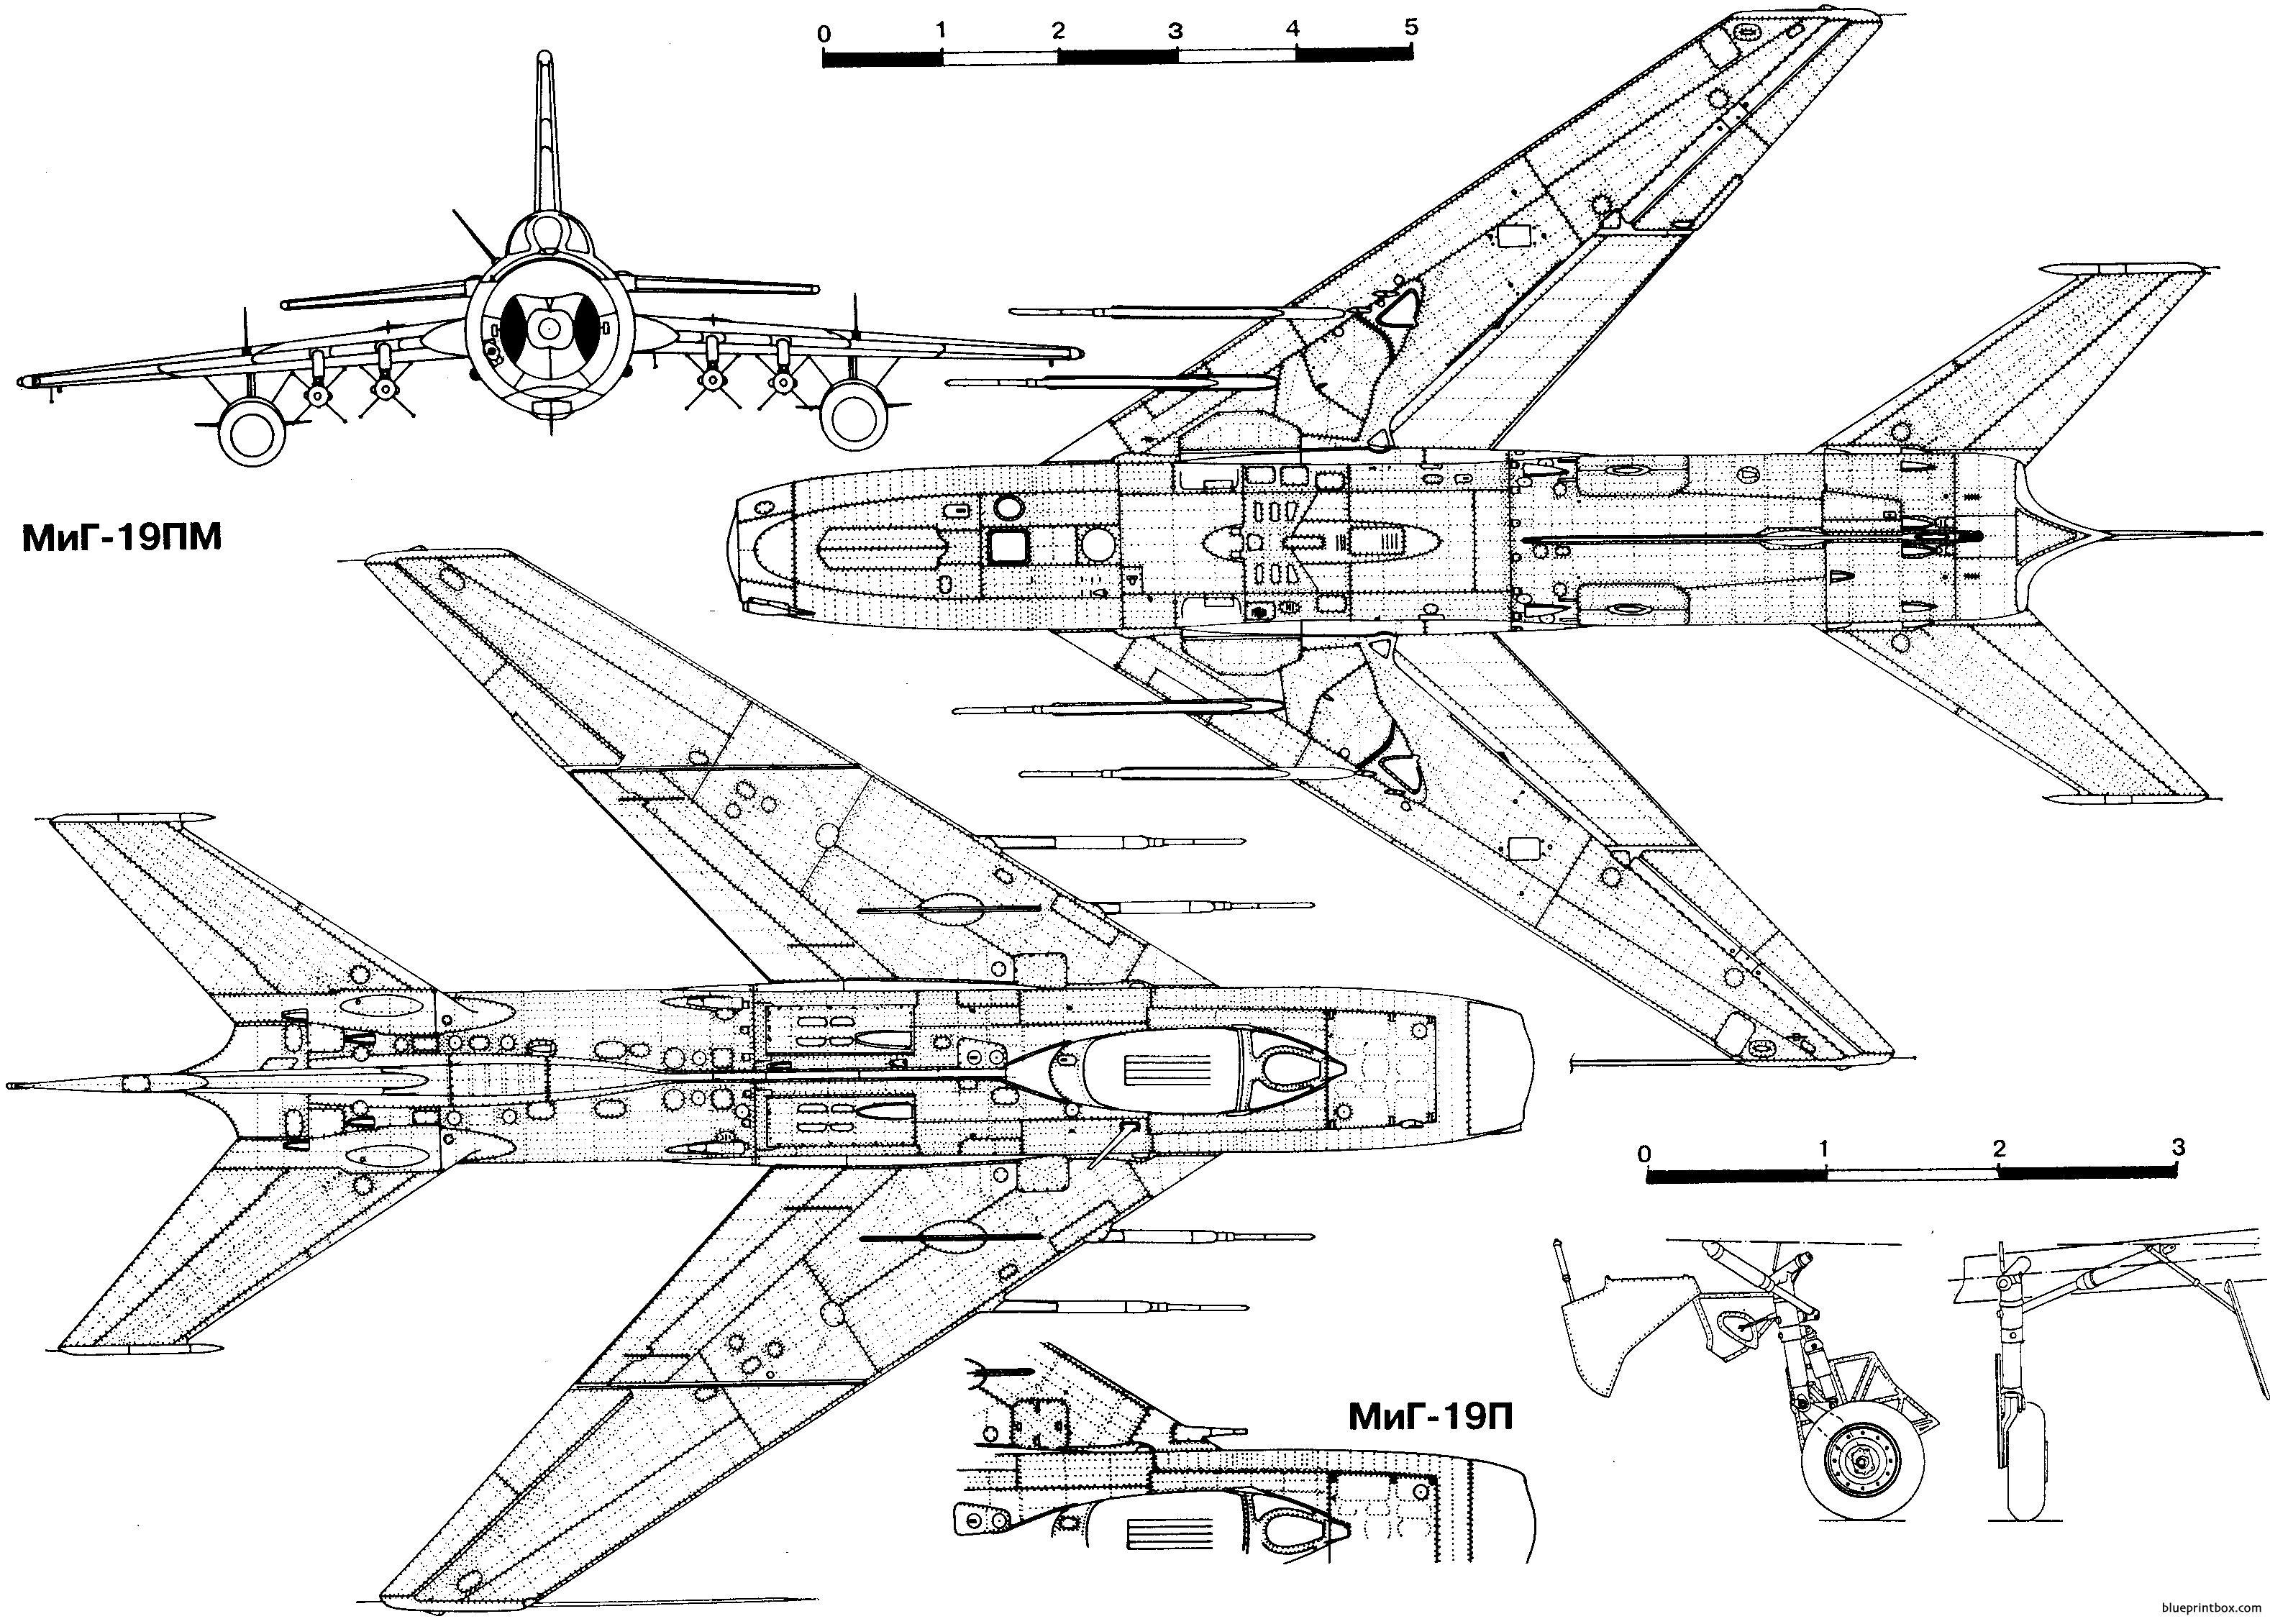 Mikoyan Gurevich Mig 19 2 - Blueprintbox Com